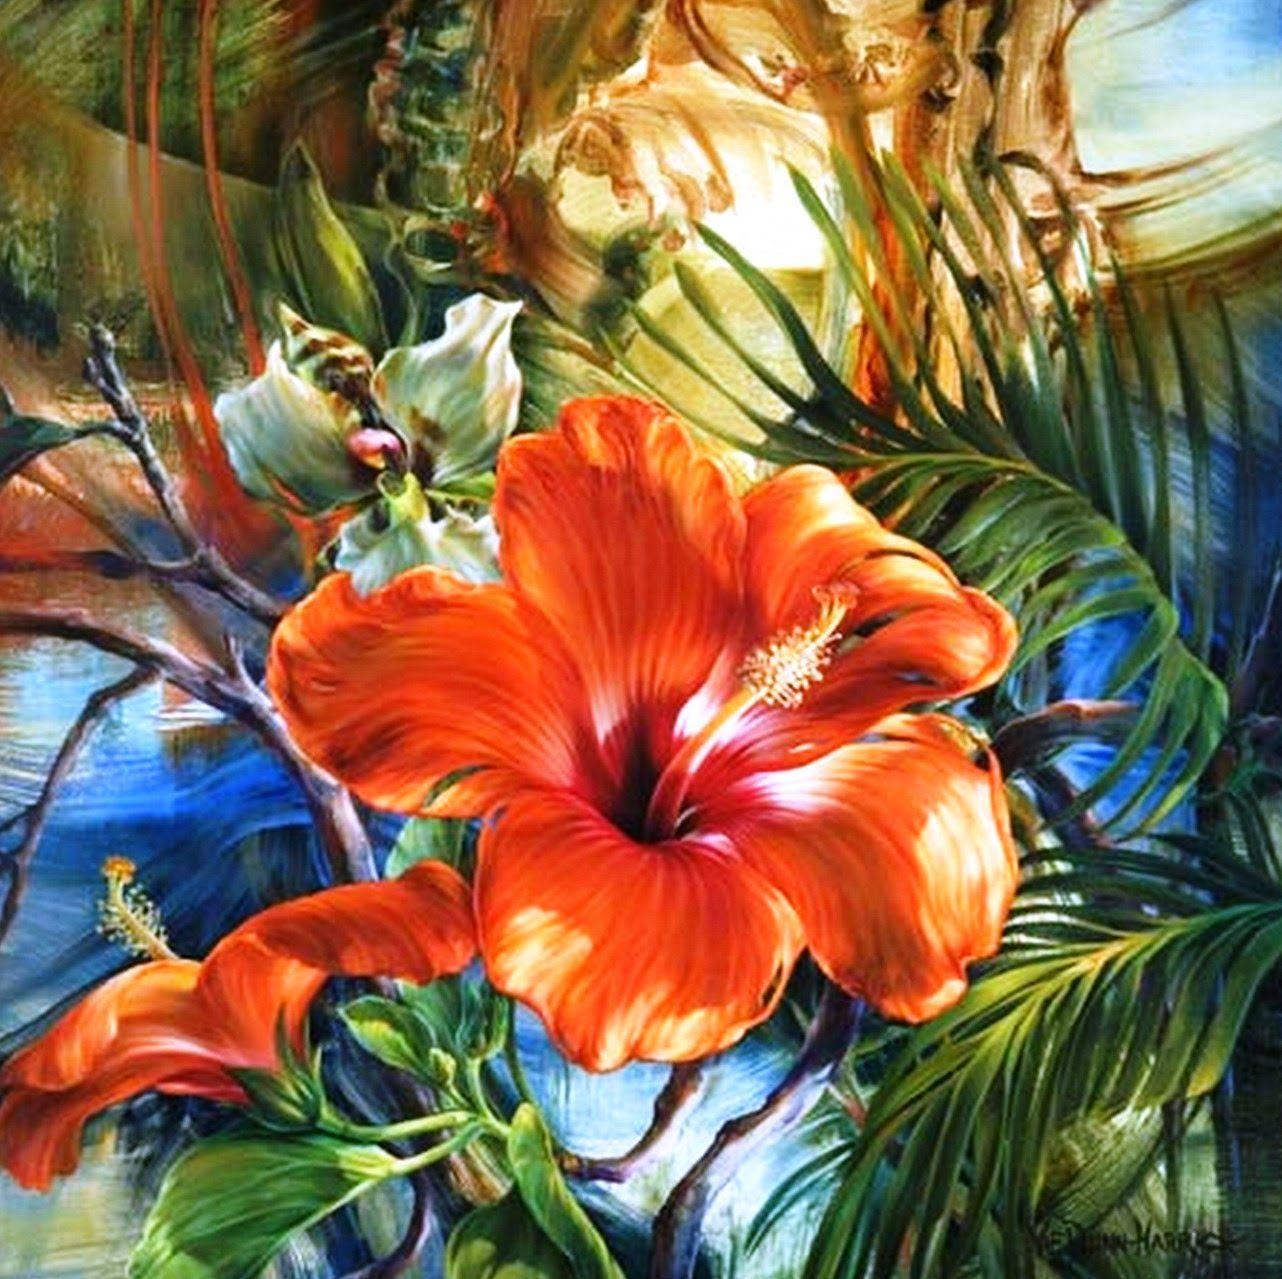 Orquideas al oleo buscar con google flores al oleo - Pinturas acrilicas modernas ...